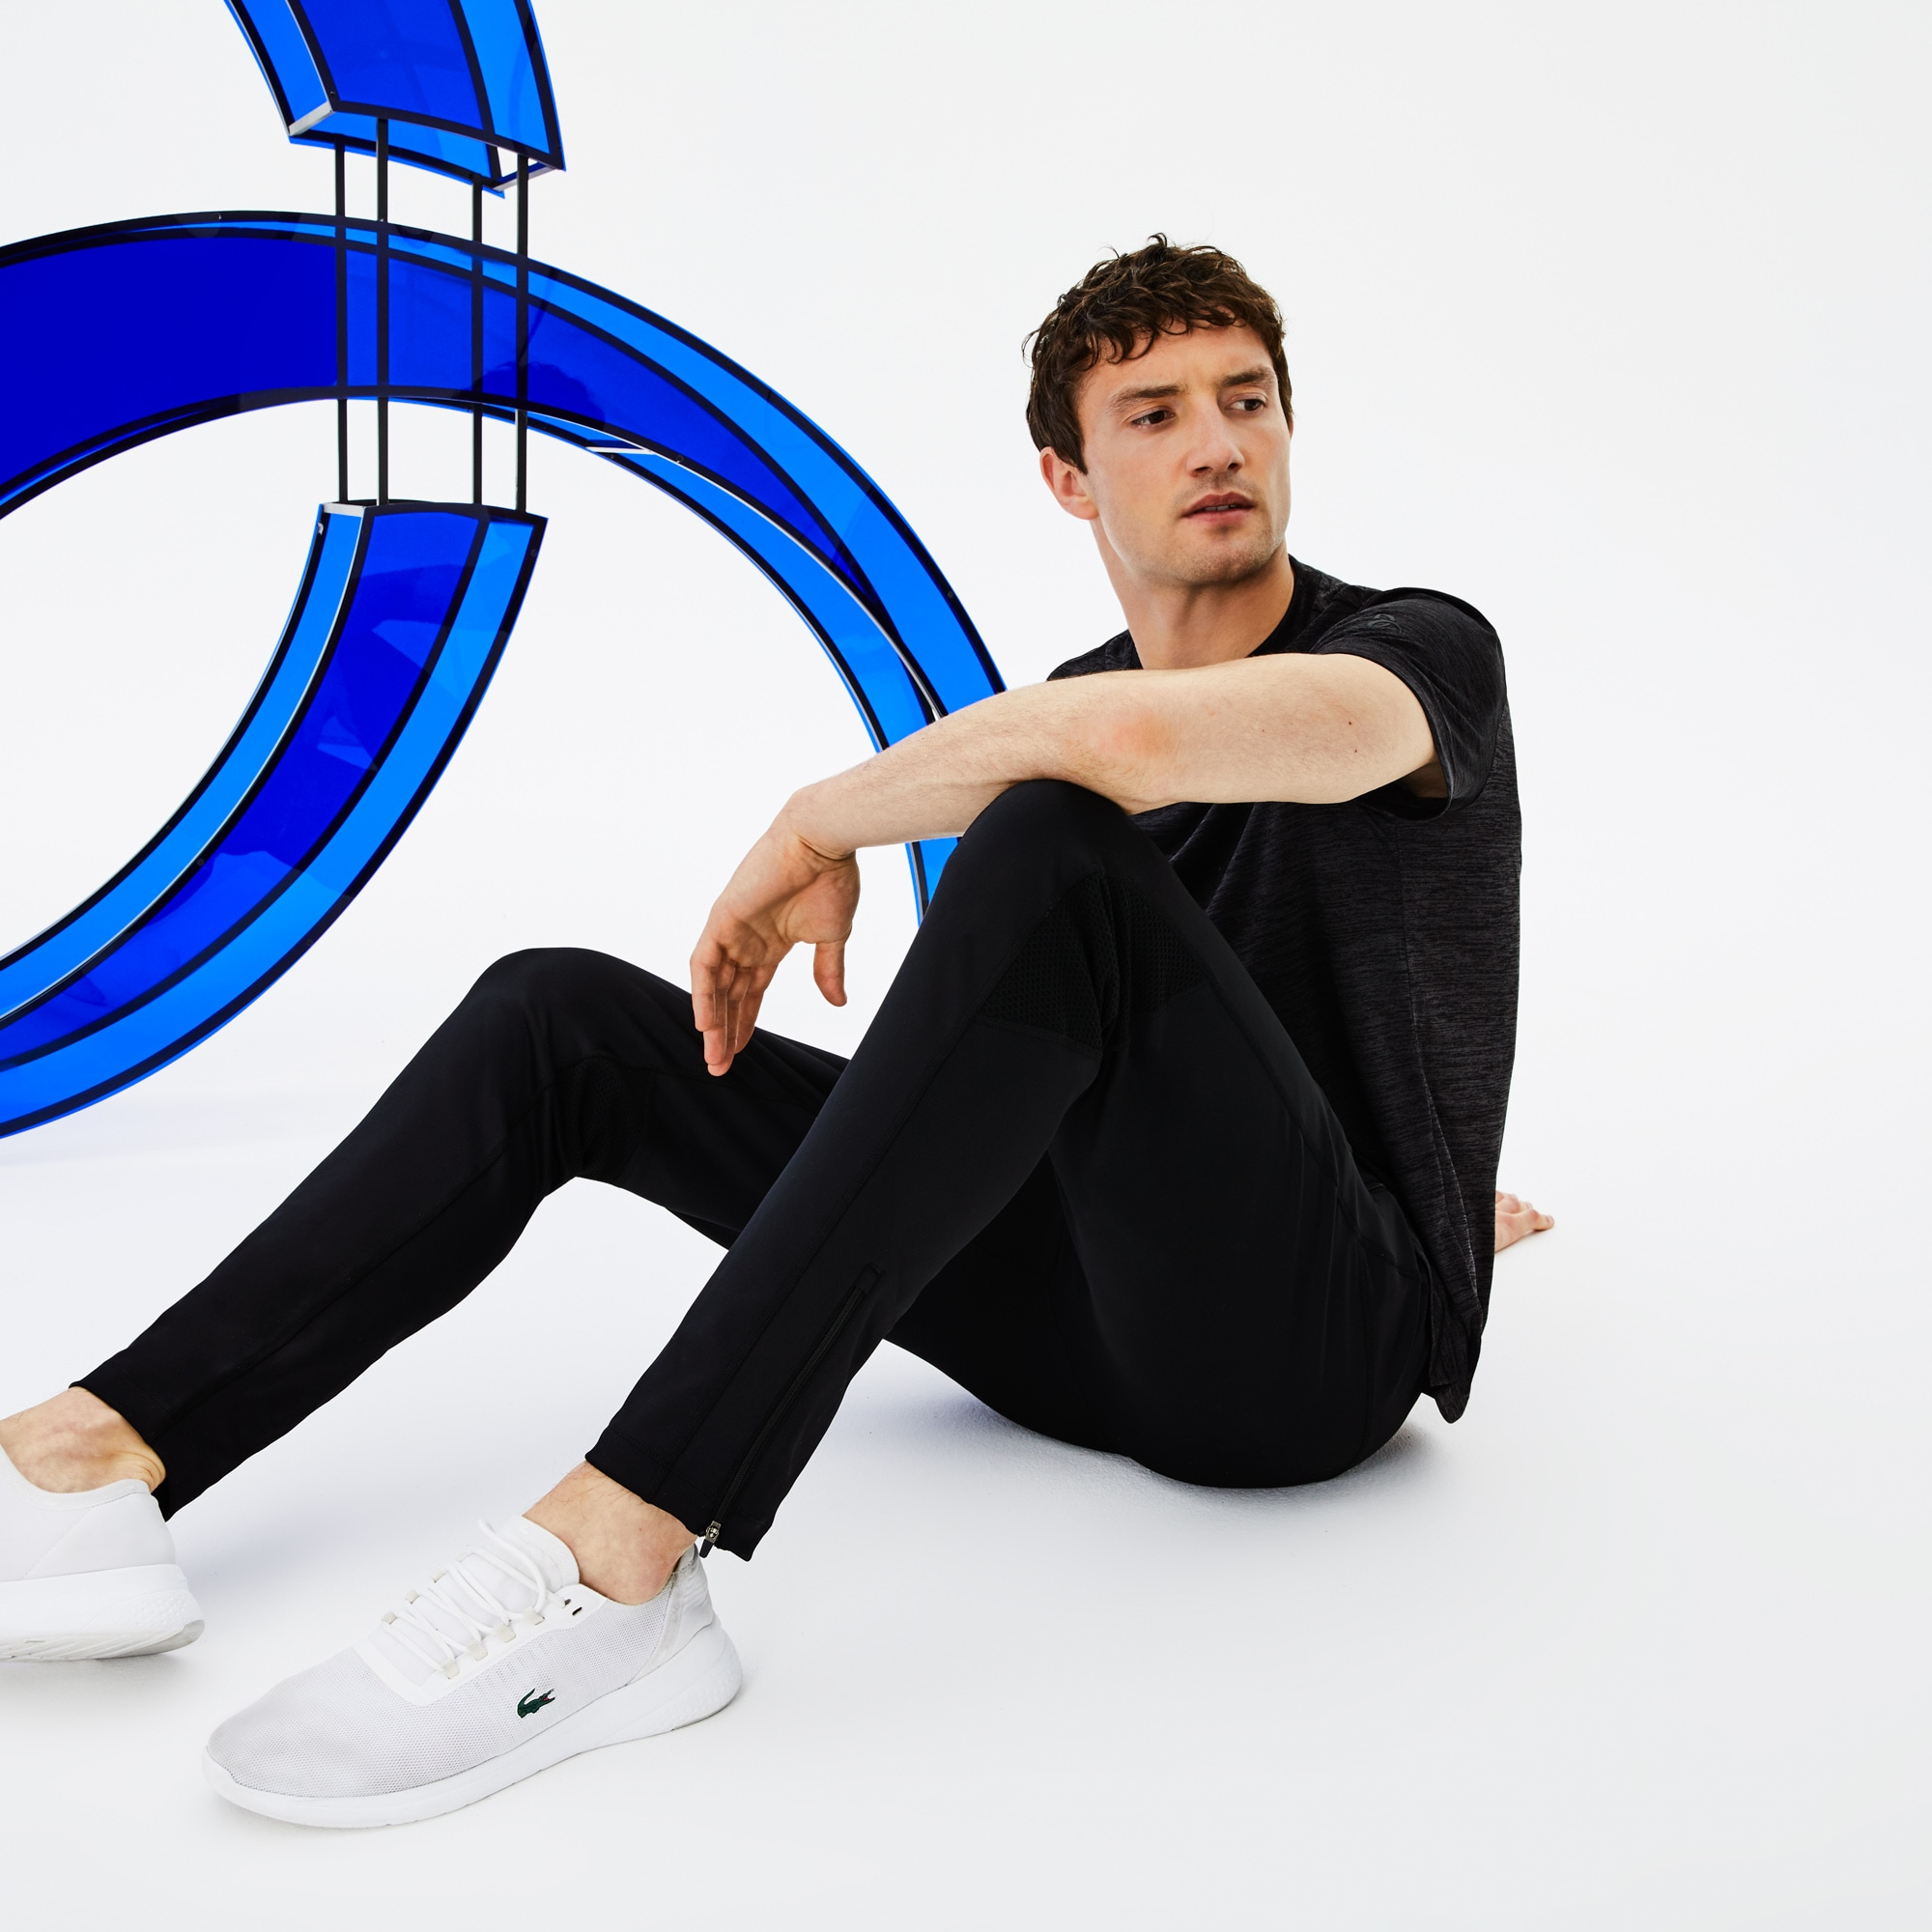 Lacoste SPORT男士网球运动裤,采用科技平纹单面针织面料制成